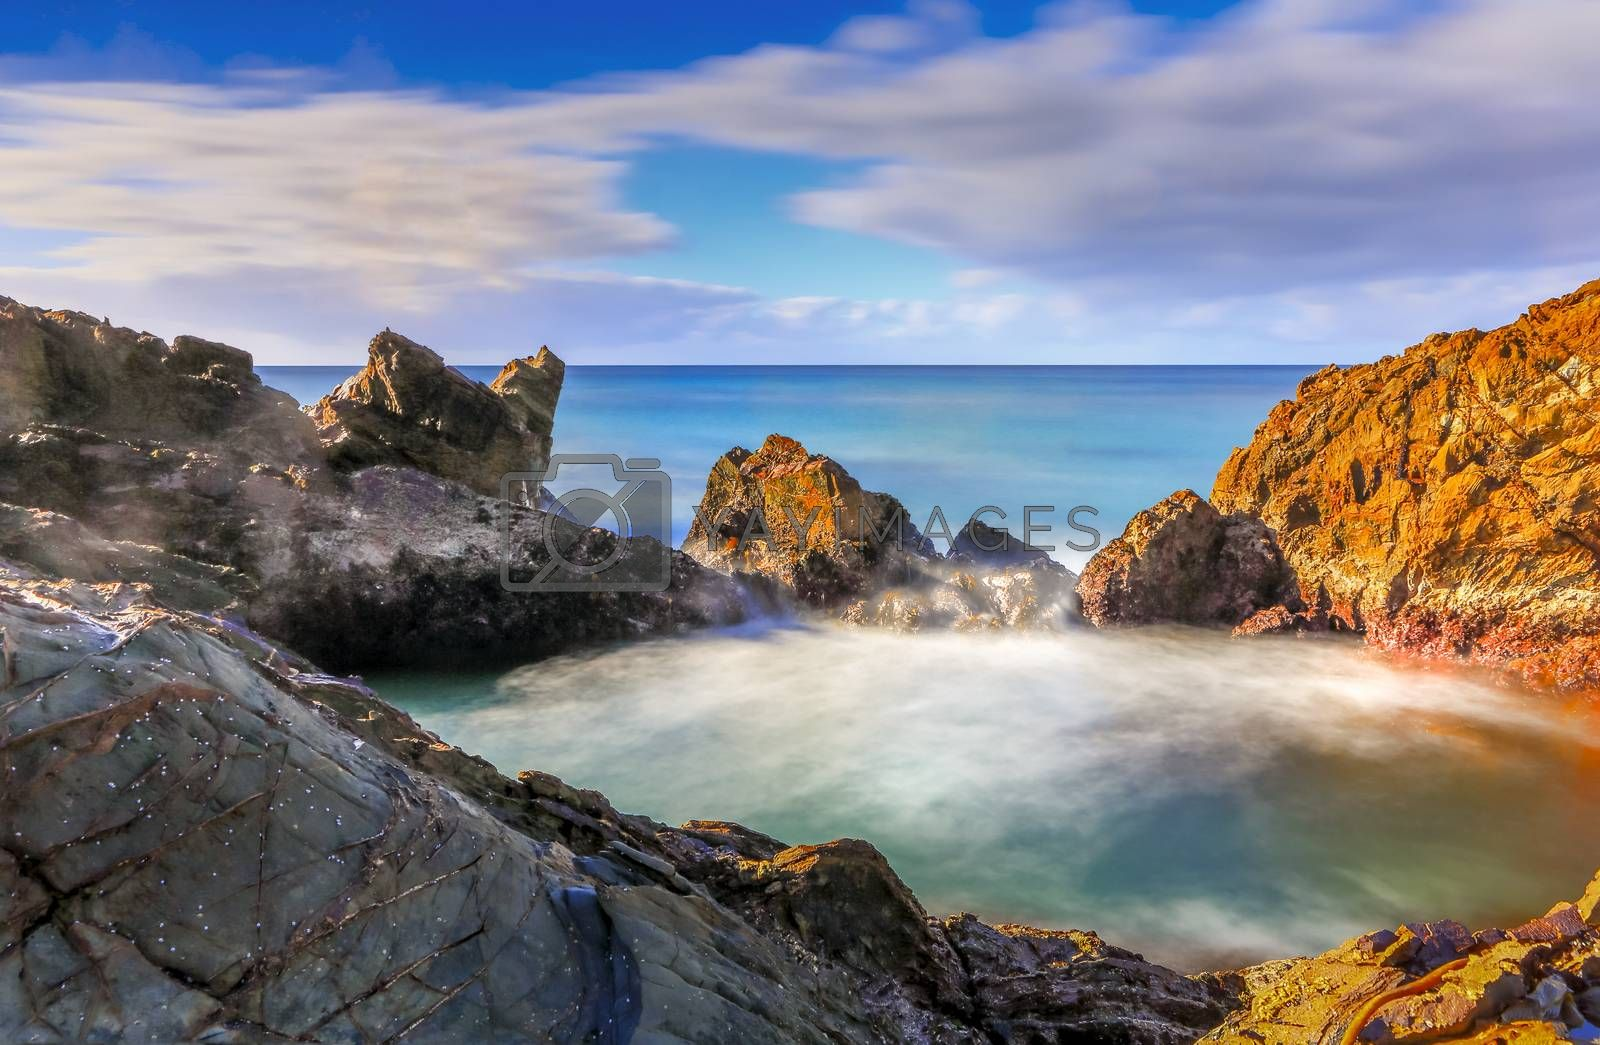 The secret rock pool.  Long Exposure taken early morning.